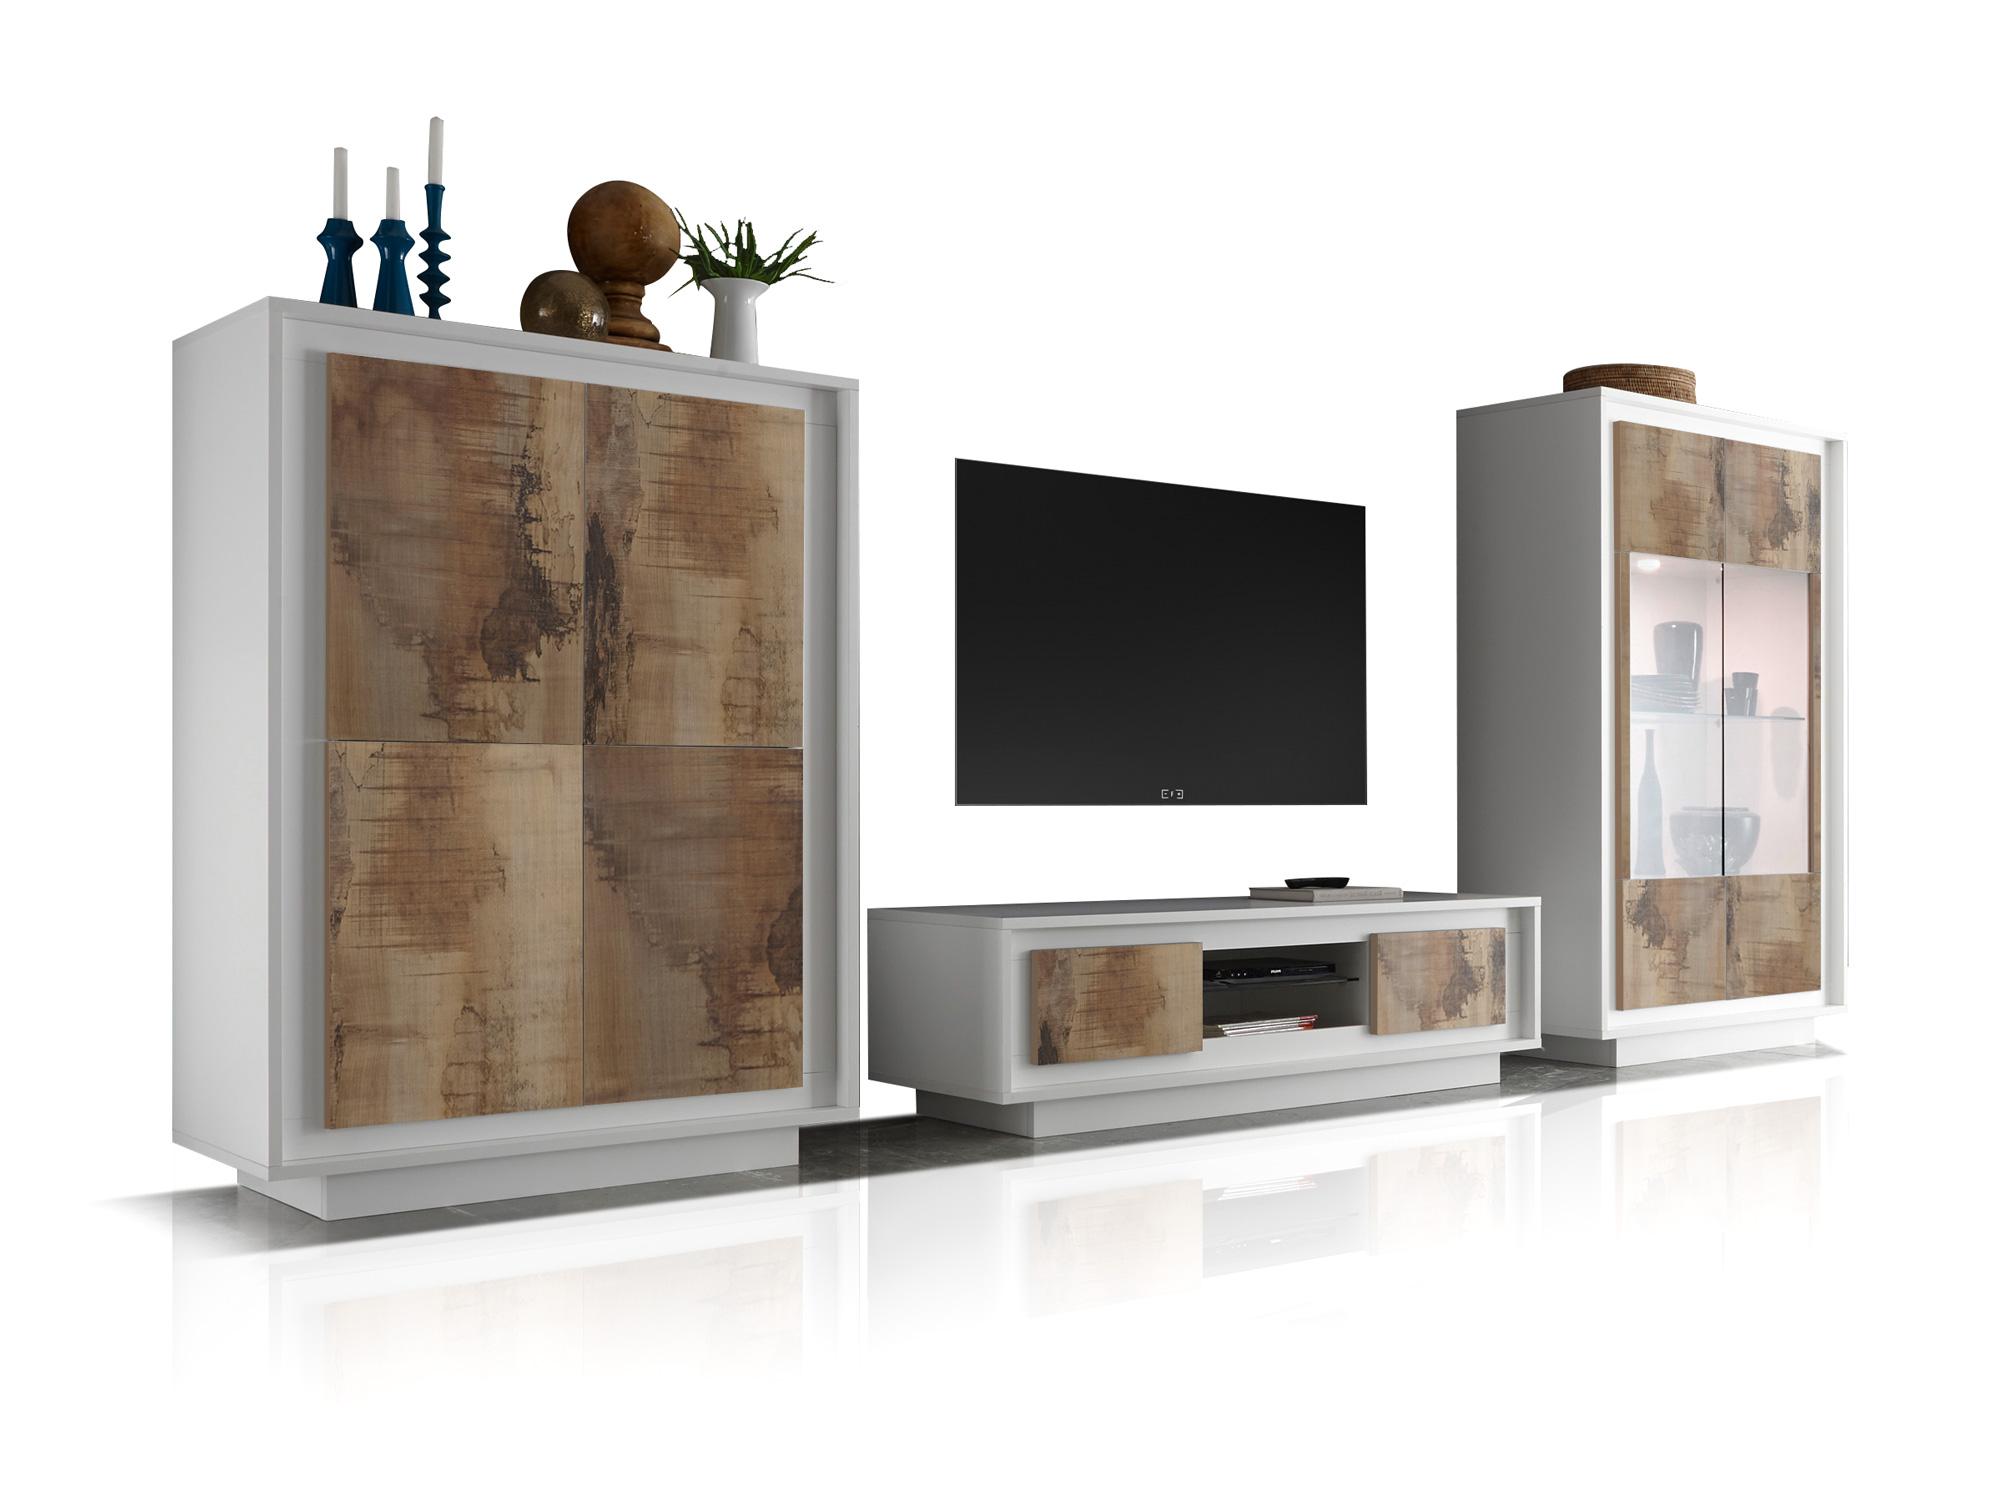 santafee wohnwand weiss pero braun. Black Bedroom Furniture Sets. Home Design Ideas